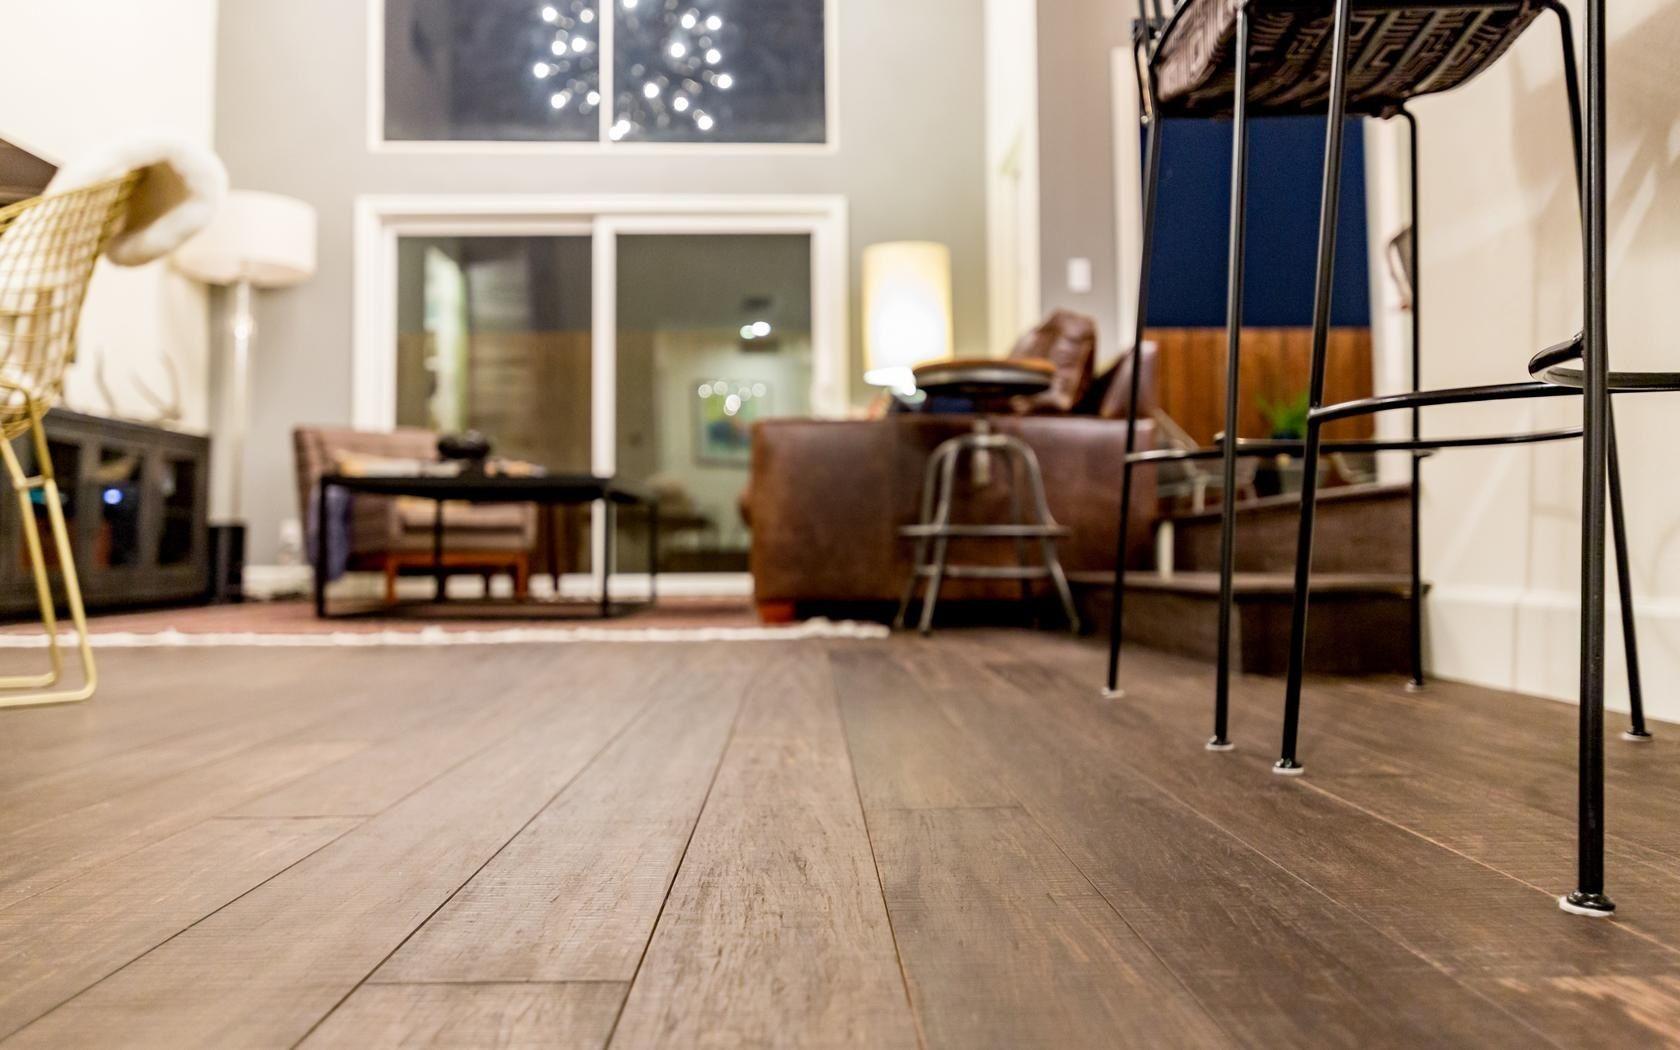 Rustic Barnwood Bamboo Flooring Chart Topping Janka Rating 50 Year Residential Warranty Matte Hardwax Oil Fin Bamboo Flooring Rustic Wood Floors Flooring